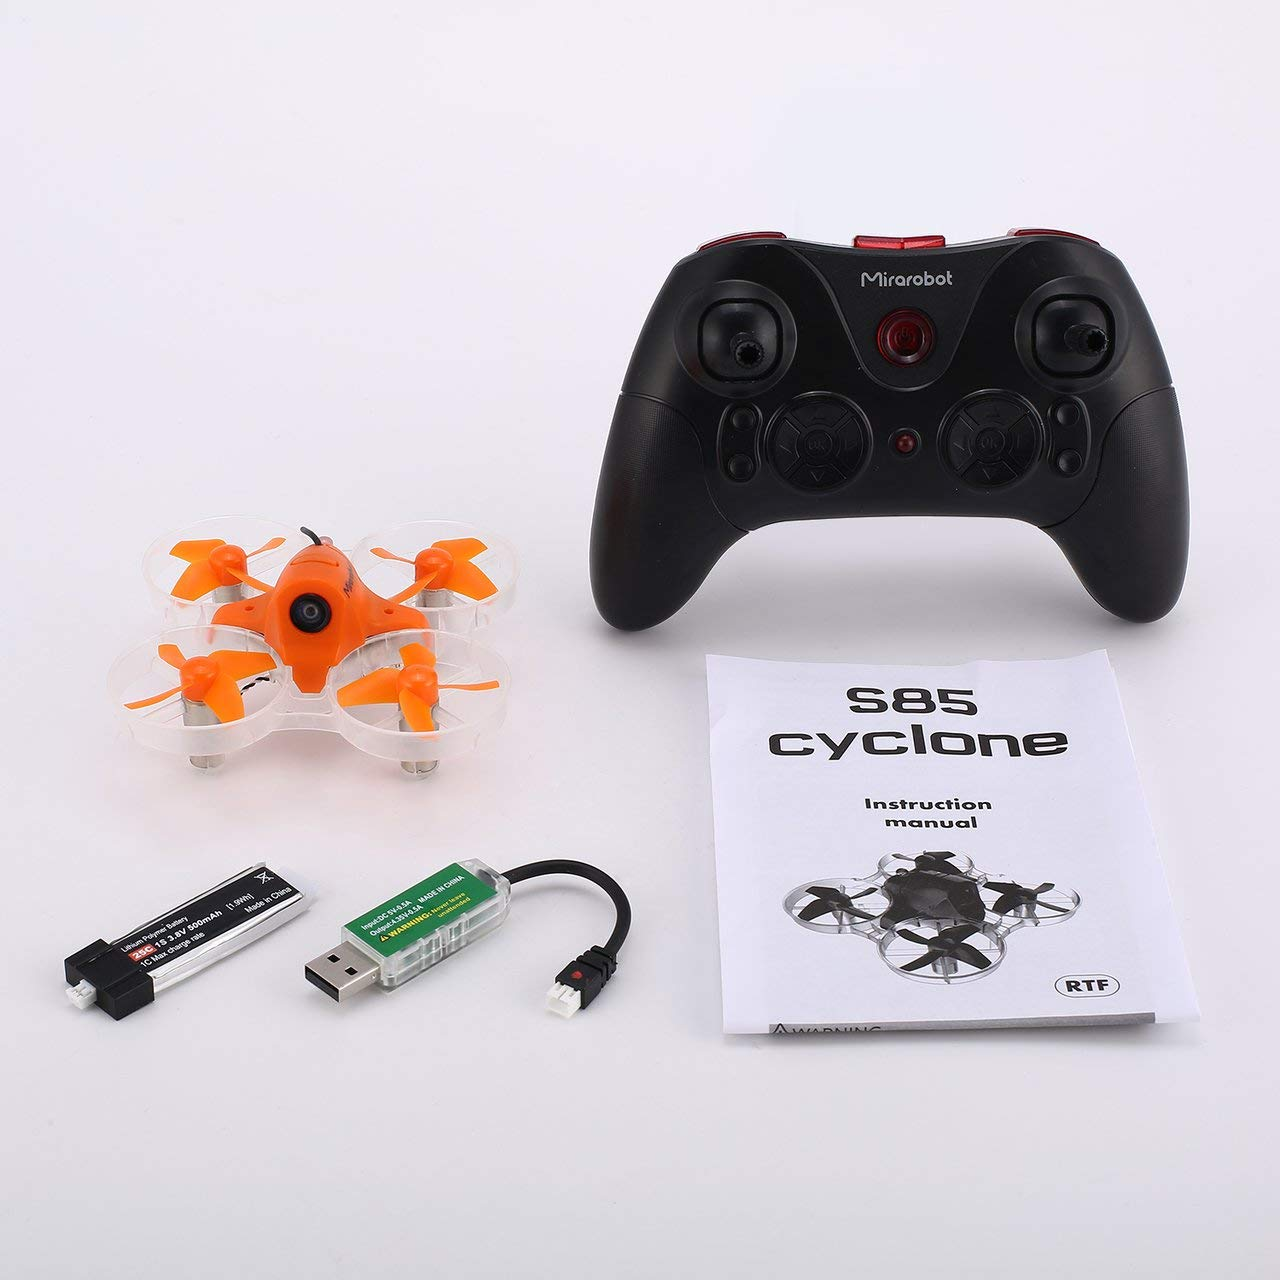 Jasnyfall Mirarobot S60 S60 S60 5.8G 25mW 600TVL Kamera Tiny Micro Indoor FPV RC Racing Drone Gelb 86c0ba